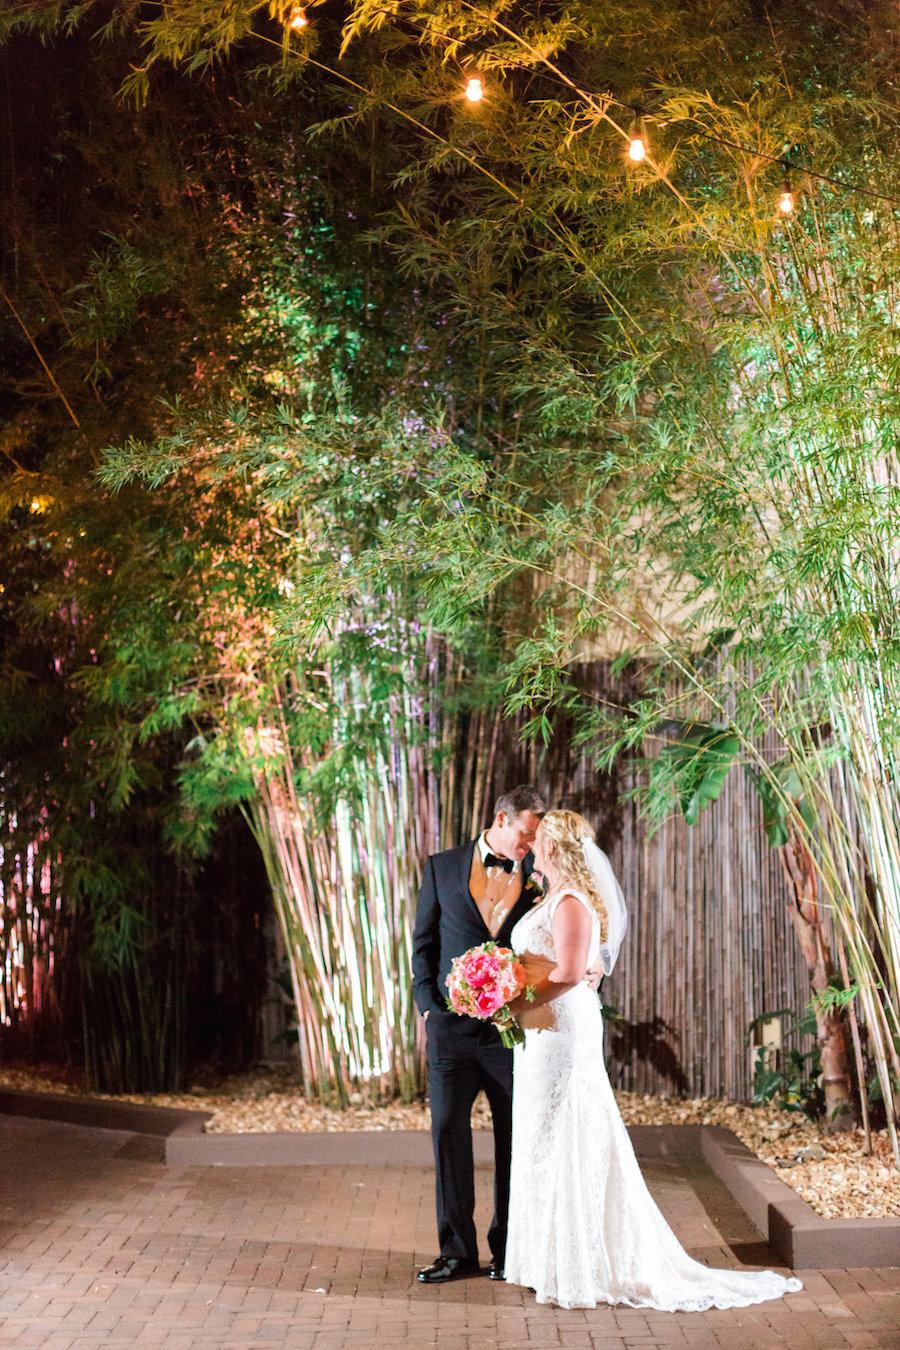 Outdoor, St Petersburg Bride and Groom Wedding Portrait   St. Pete Wedding and Event Venue NOVA 535